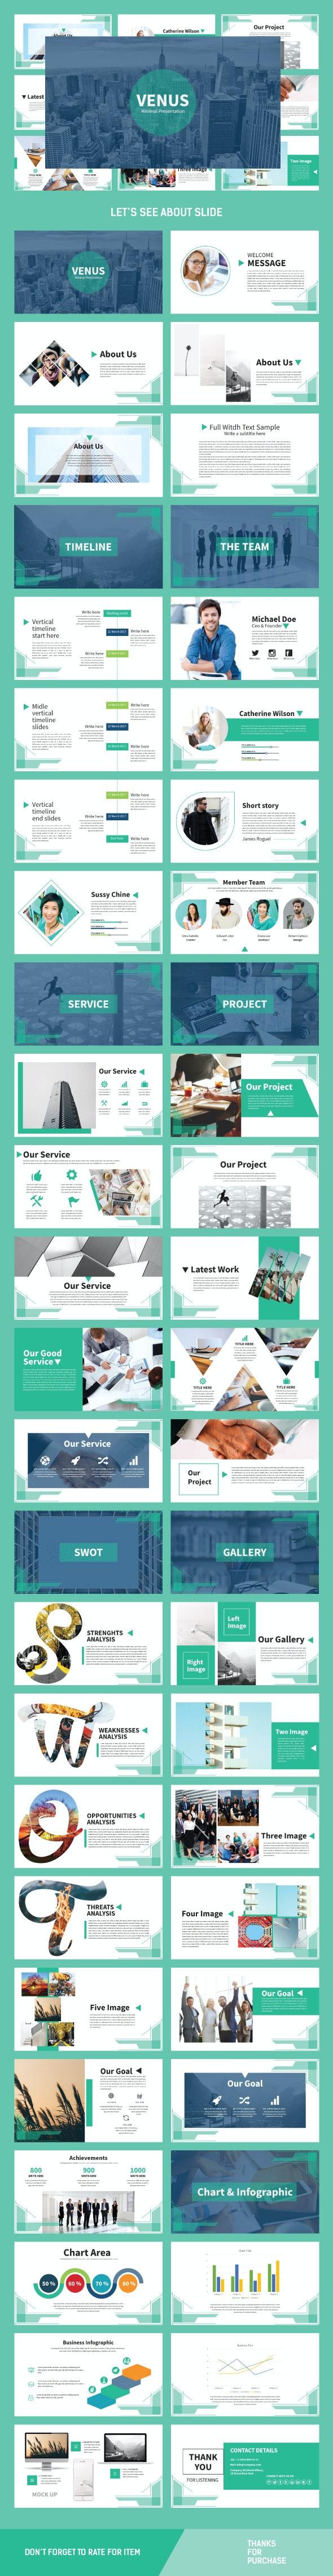 Venus Multipurpose Template - Business PowerPoint Templates